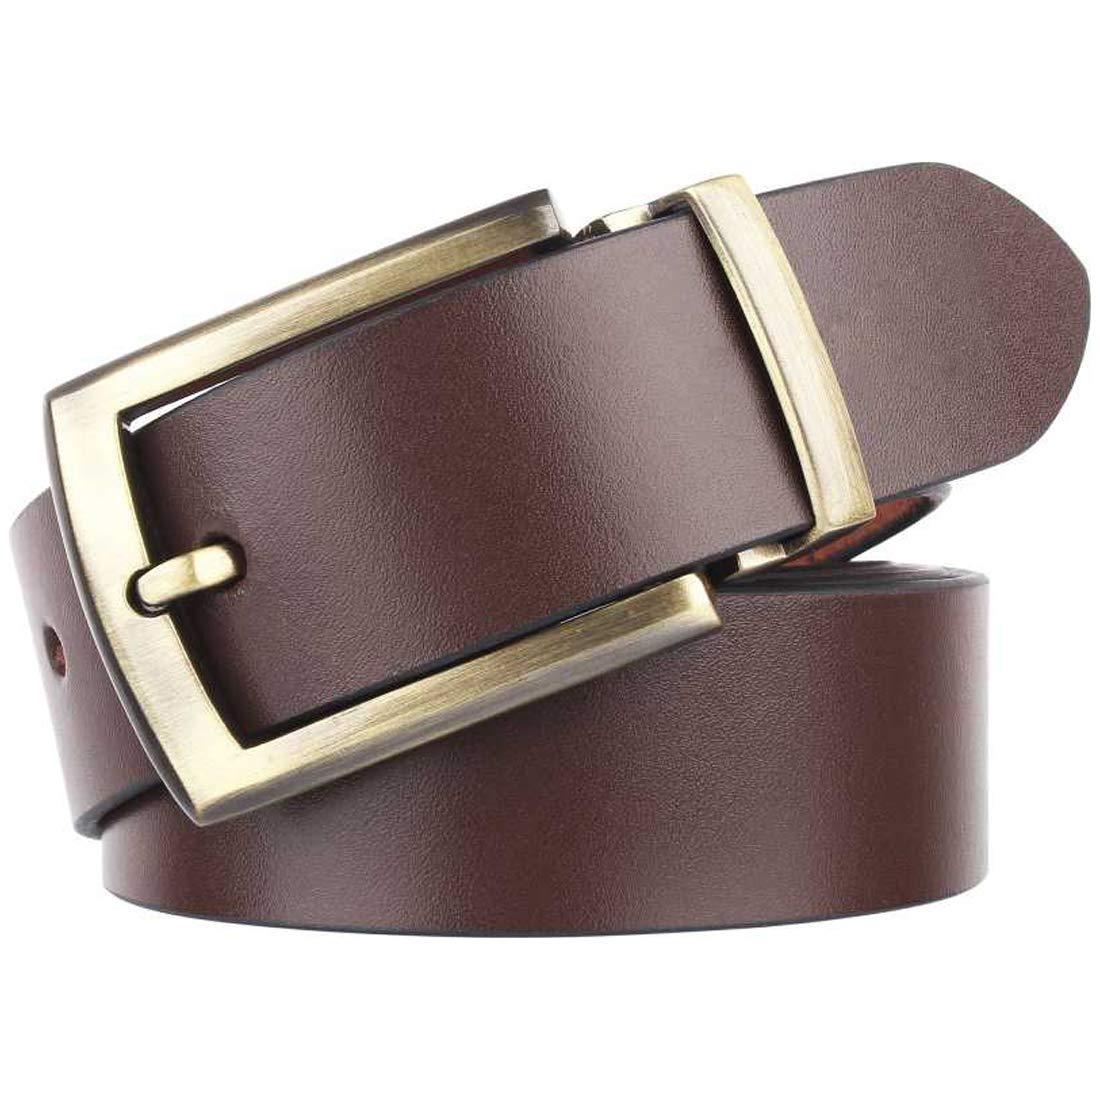 Mens Leather Belt Manufacturers in delhi